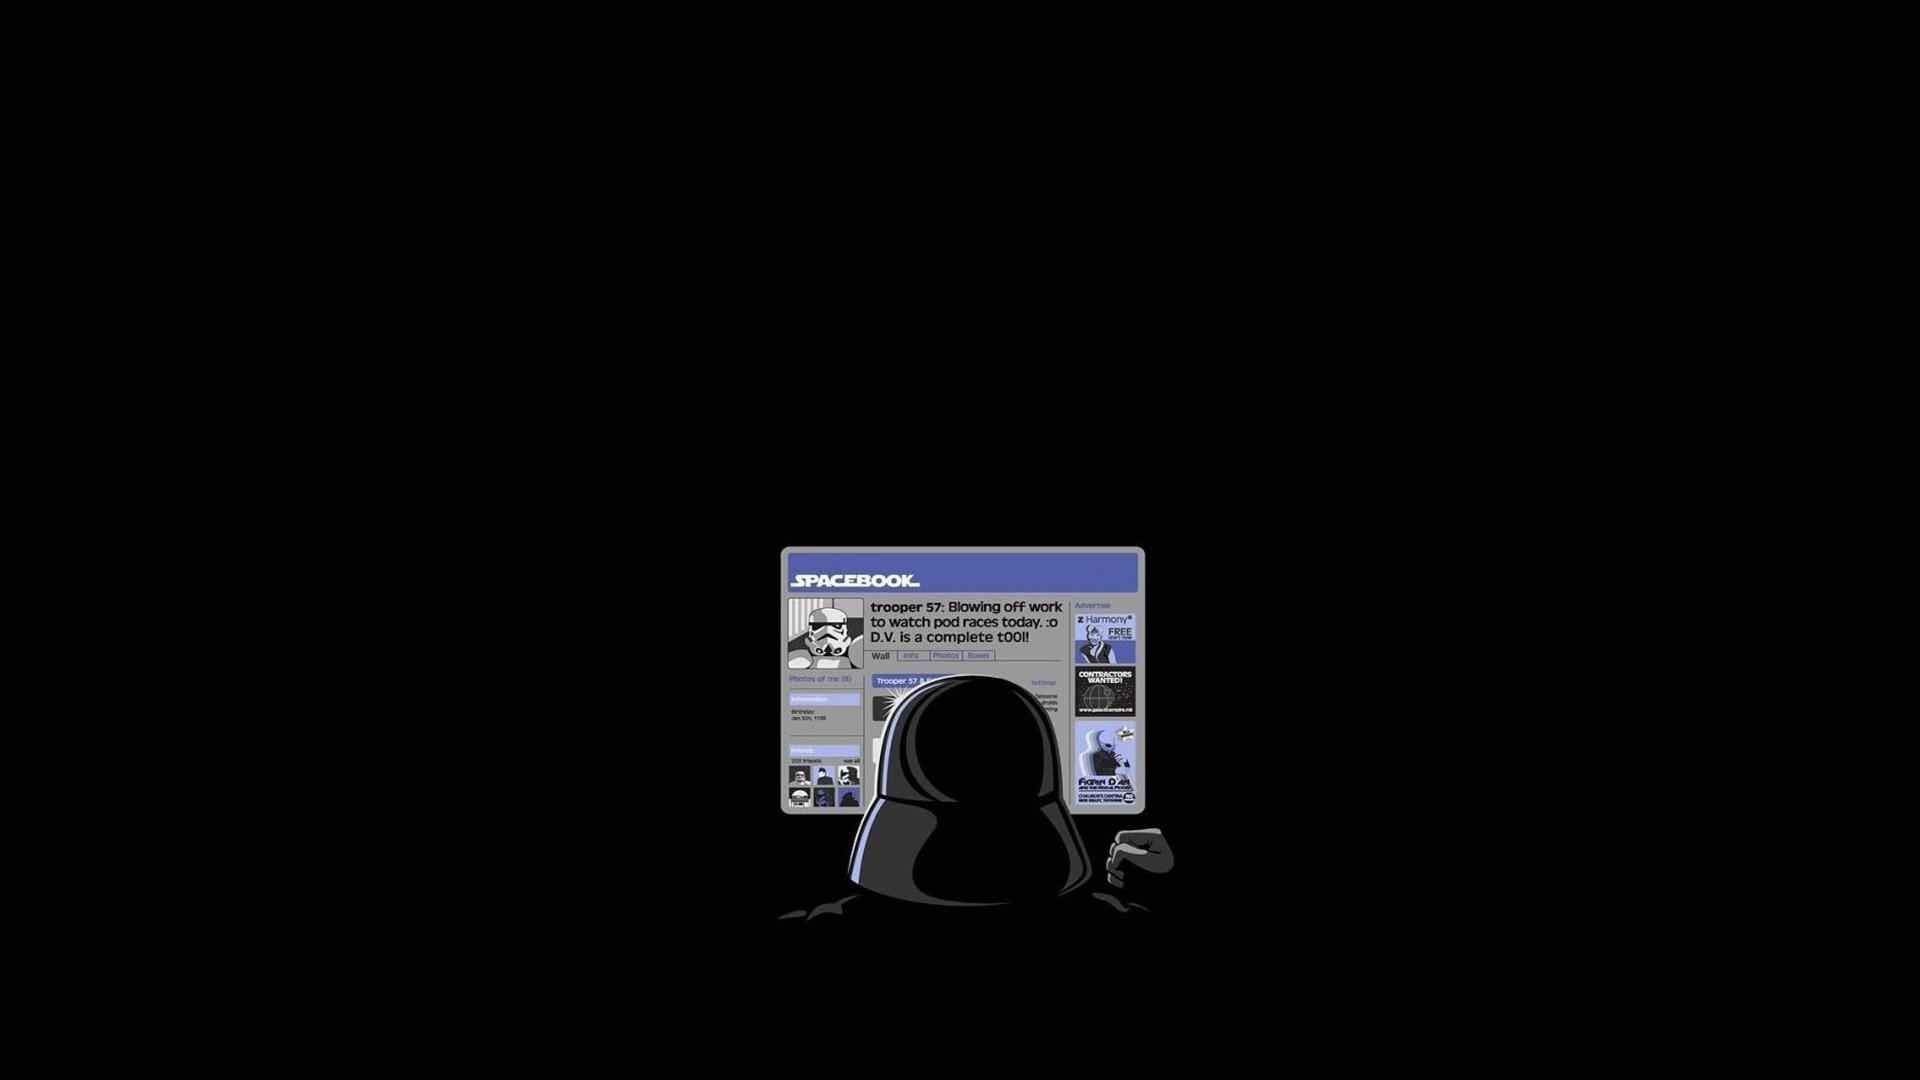 Star Wars simple background minimalism humor text Darth Vader brand Facebook multimedia screenshot font 229520